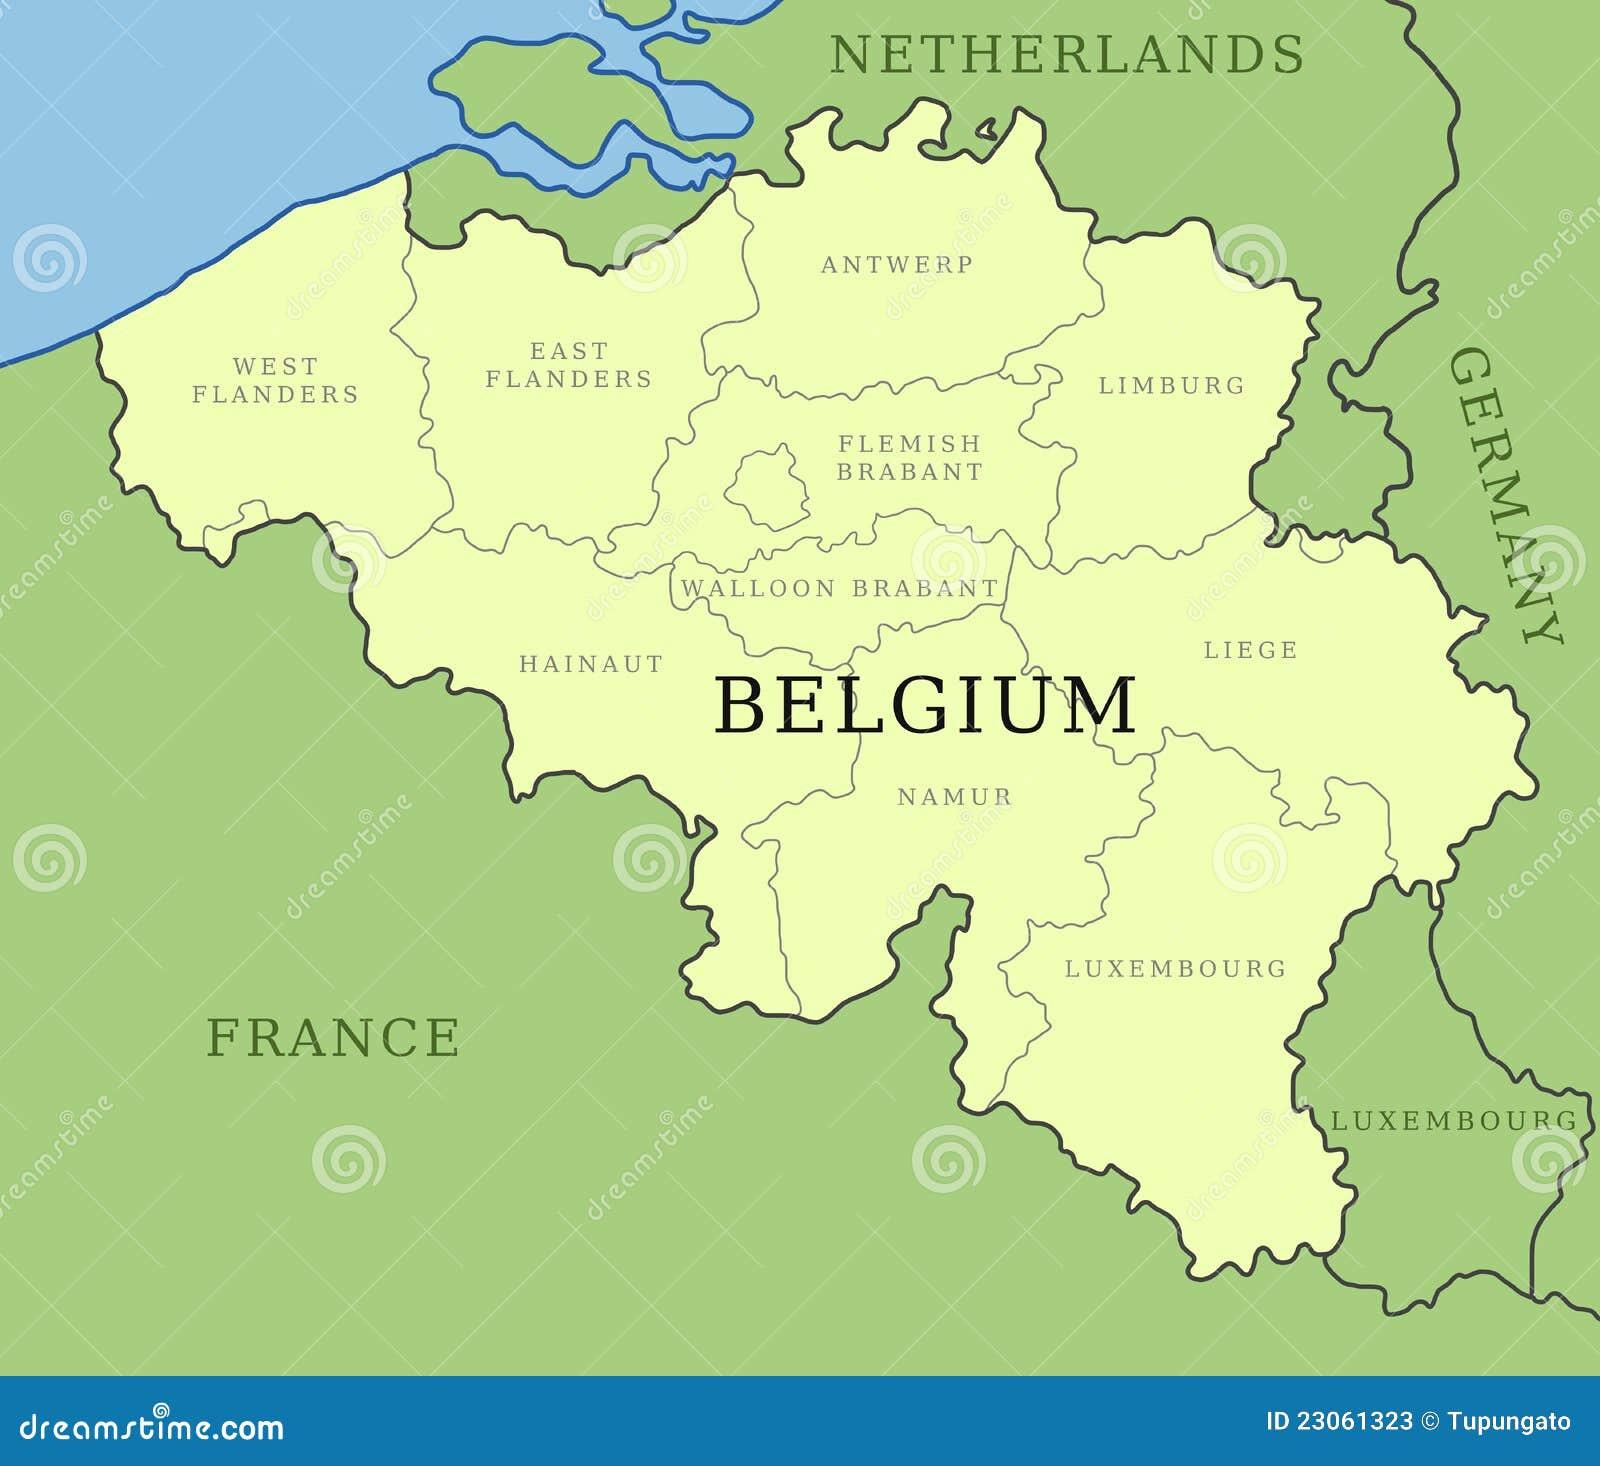 Belgium Provinces Map Photos Image 23061323 – Belgium Provinces Map